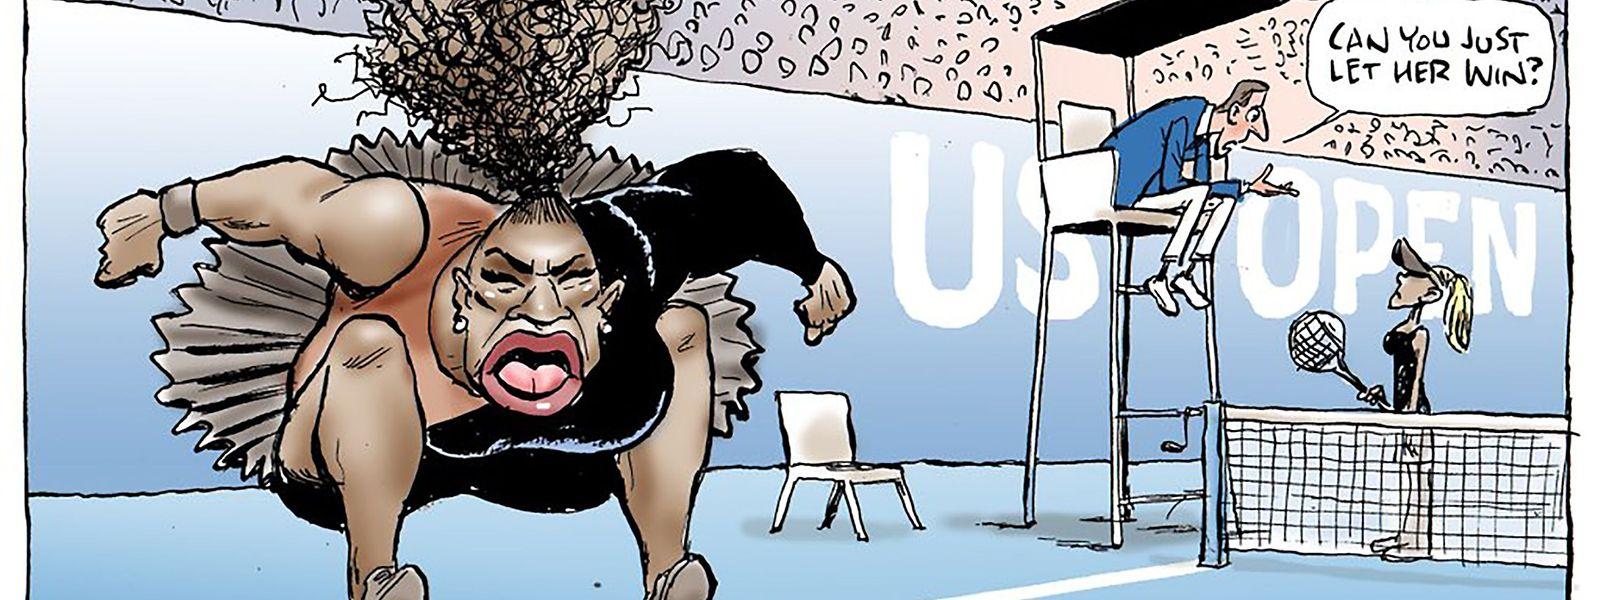 La caricature de Mark Knight